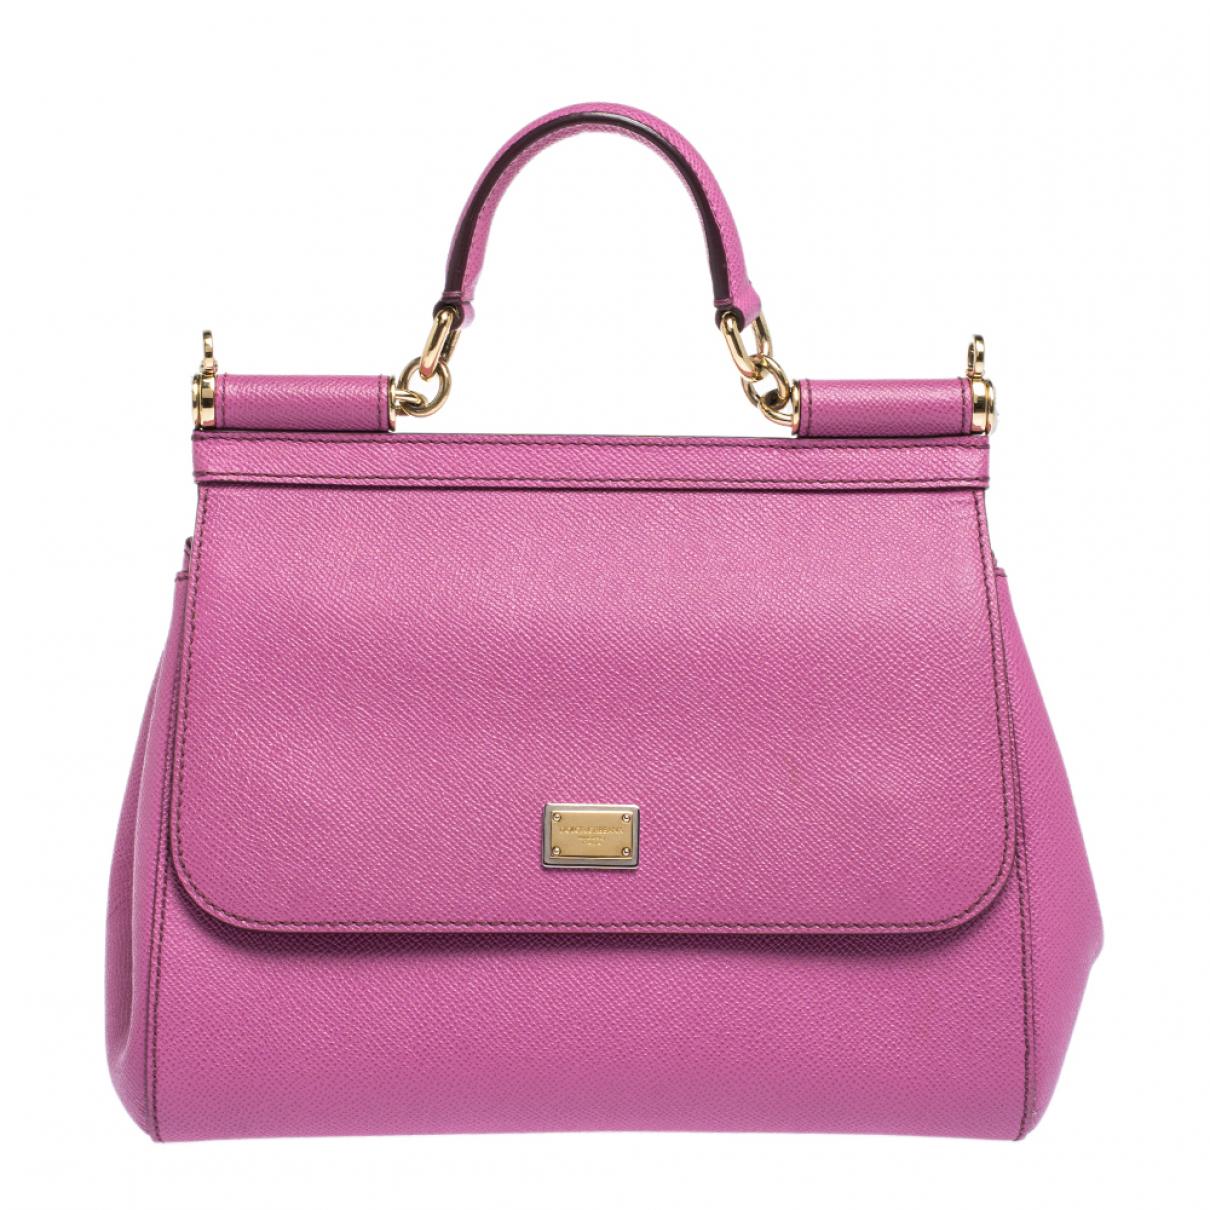 Dolce & Gabbana Sicily Handtasche in  Rosa Leder